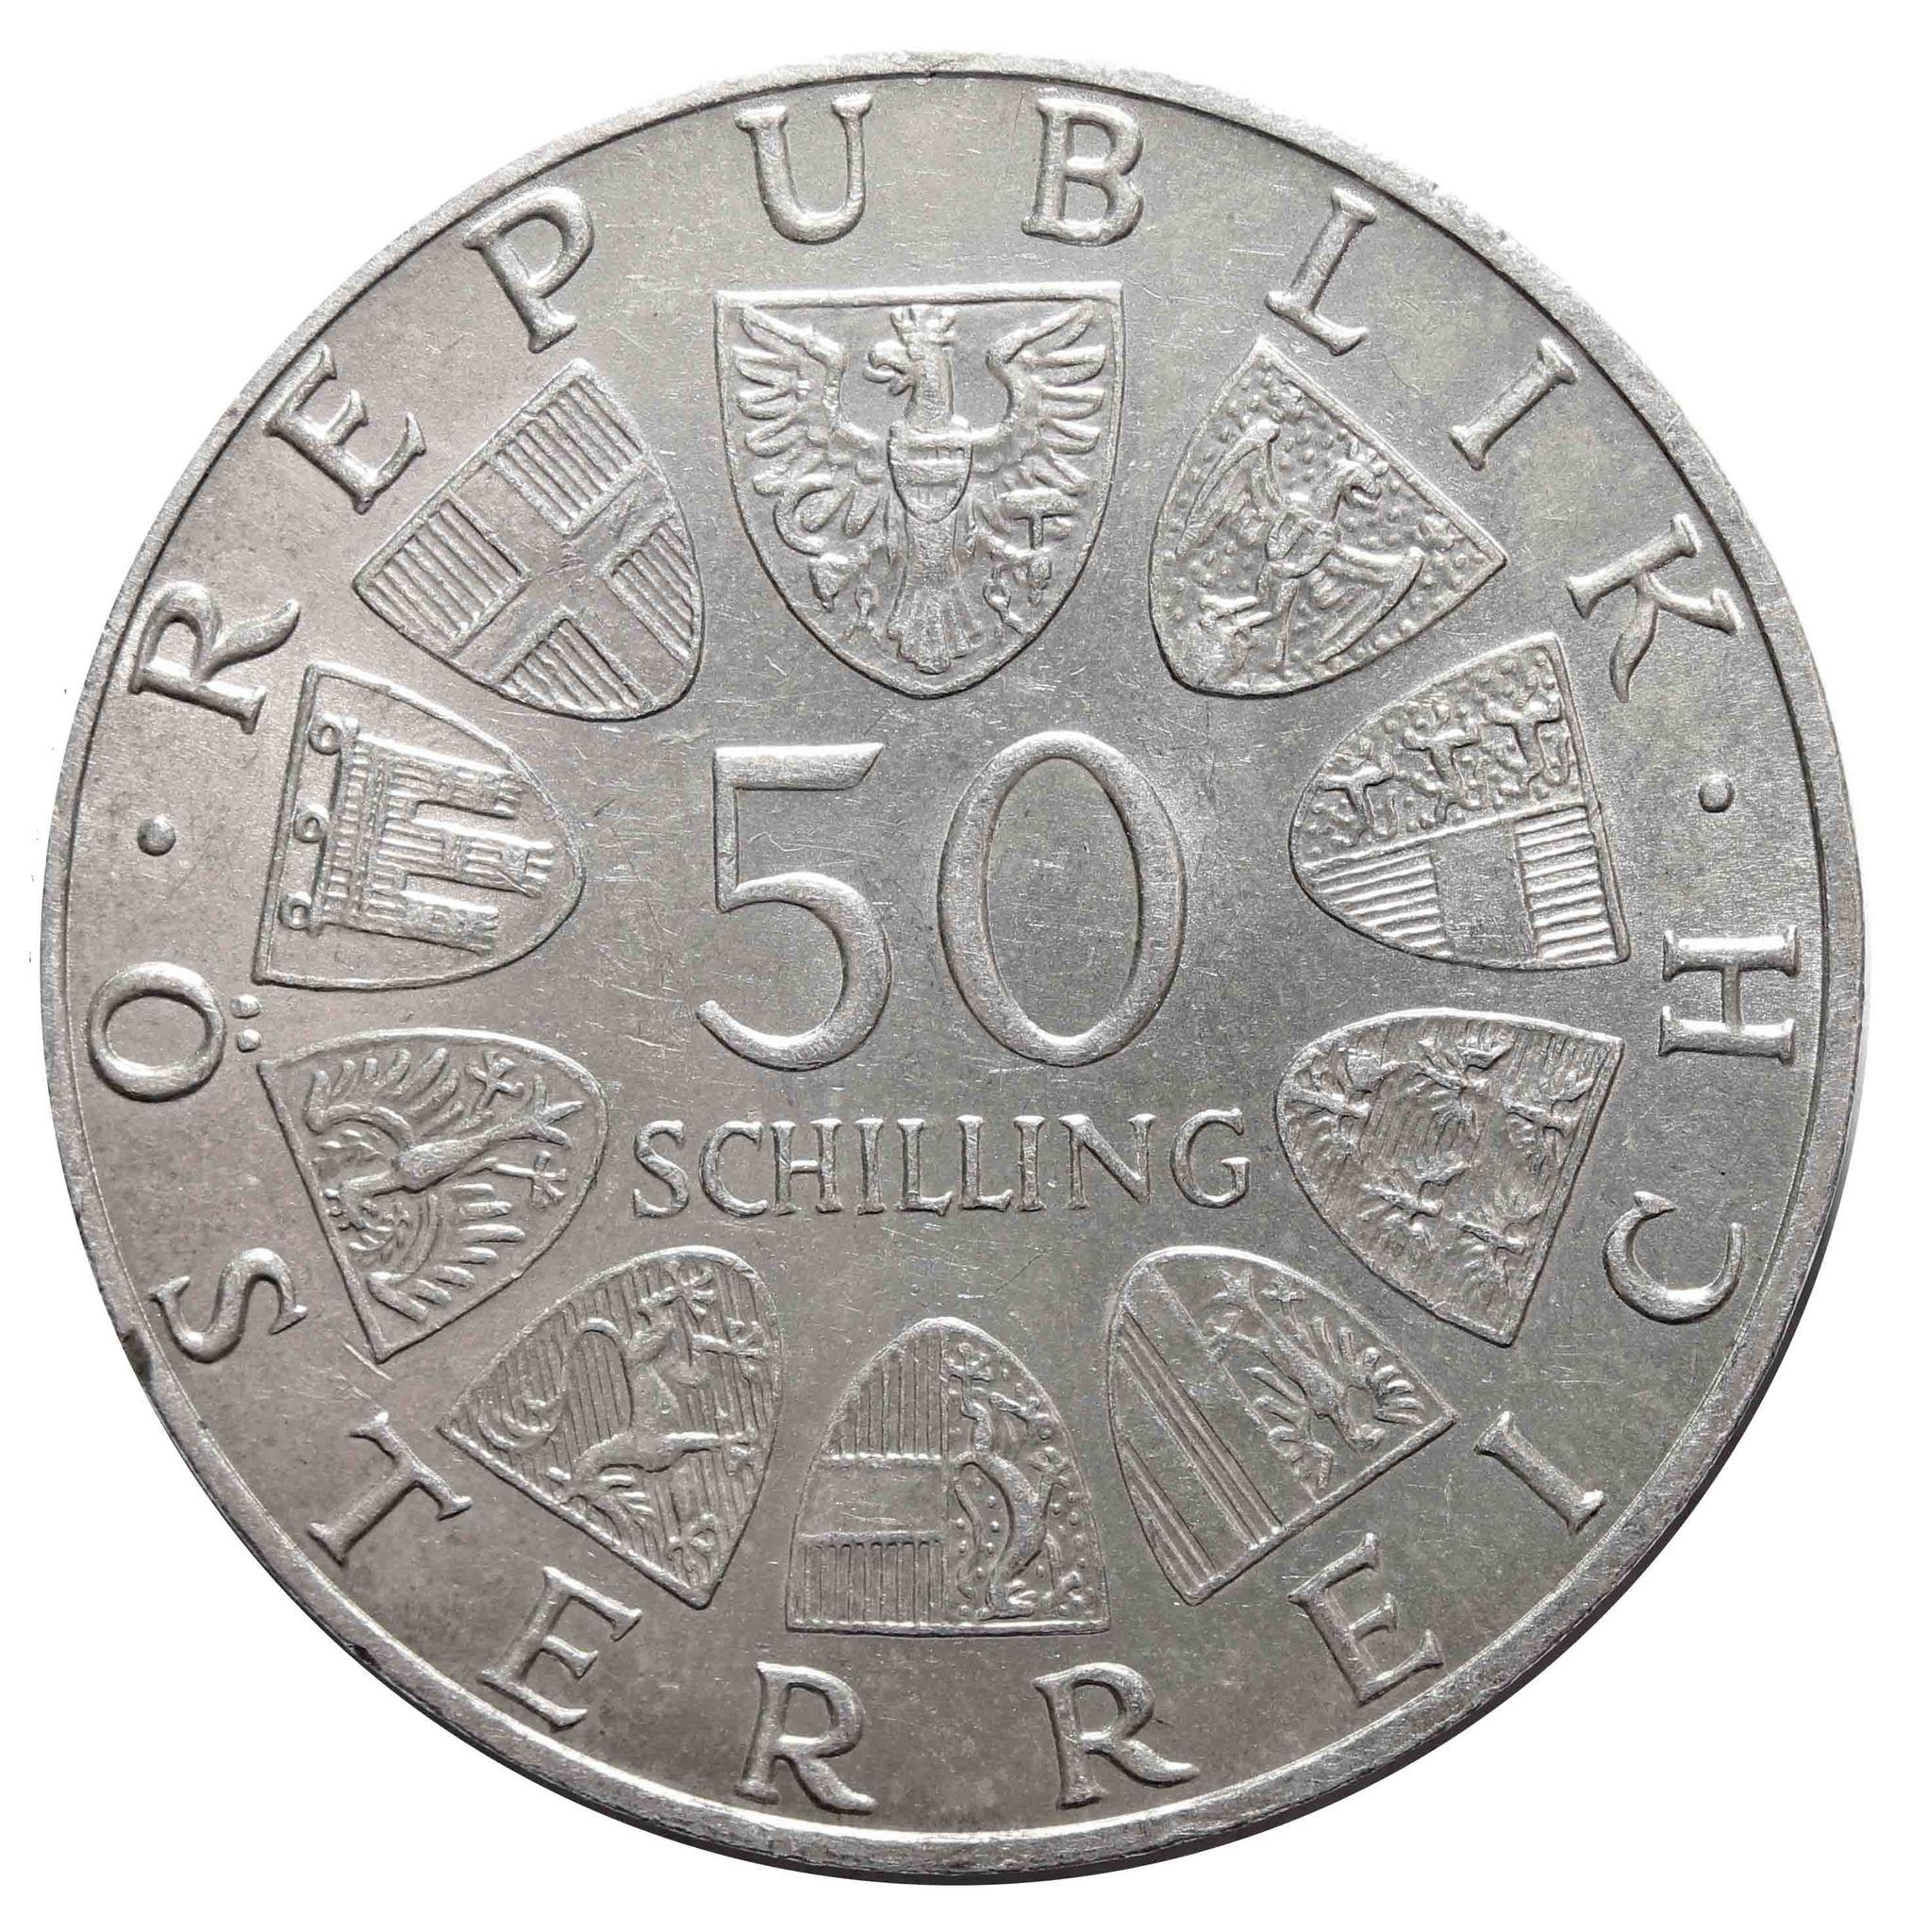 50 шиллингов. 150 лет со дня смерти Франца Шуберта. Австрия. 1978 год. Серебро. AU